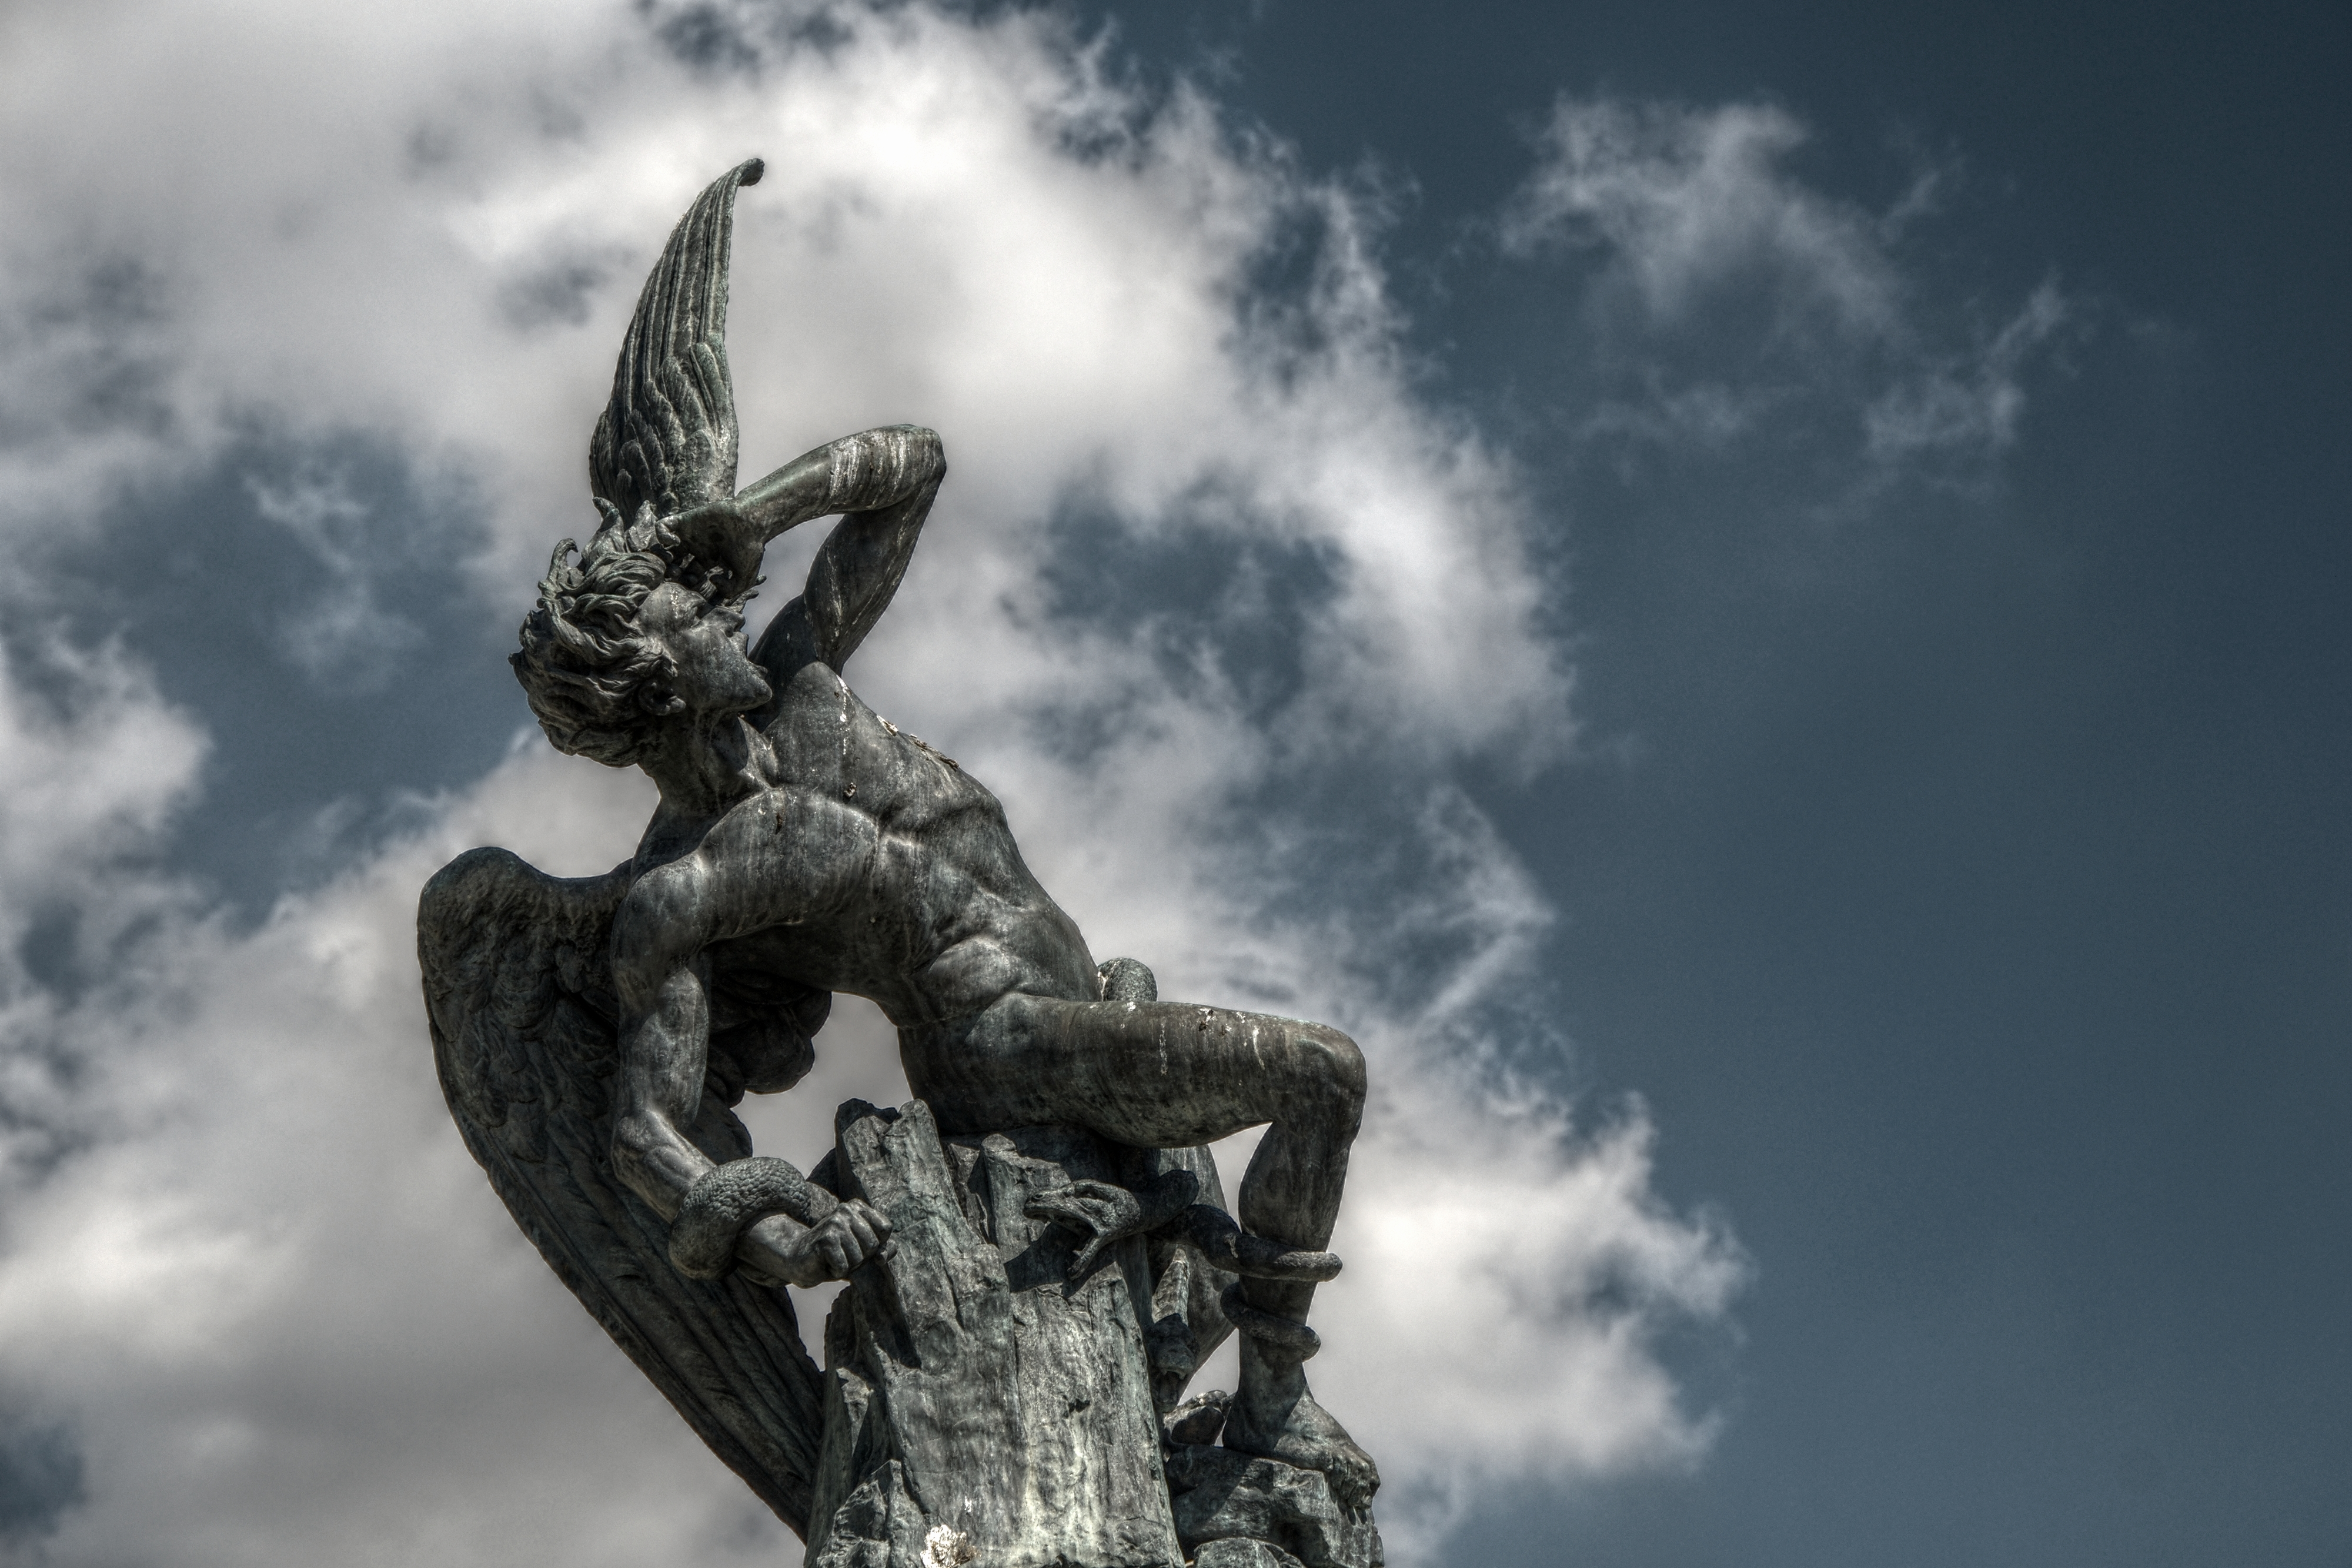 El Ángel Caído / The Fallen Angel. Jardines del Buen Retiro, Madrid, Spain.